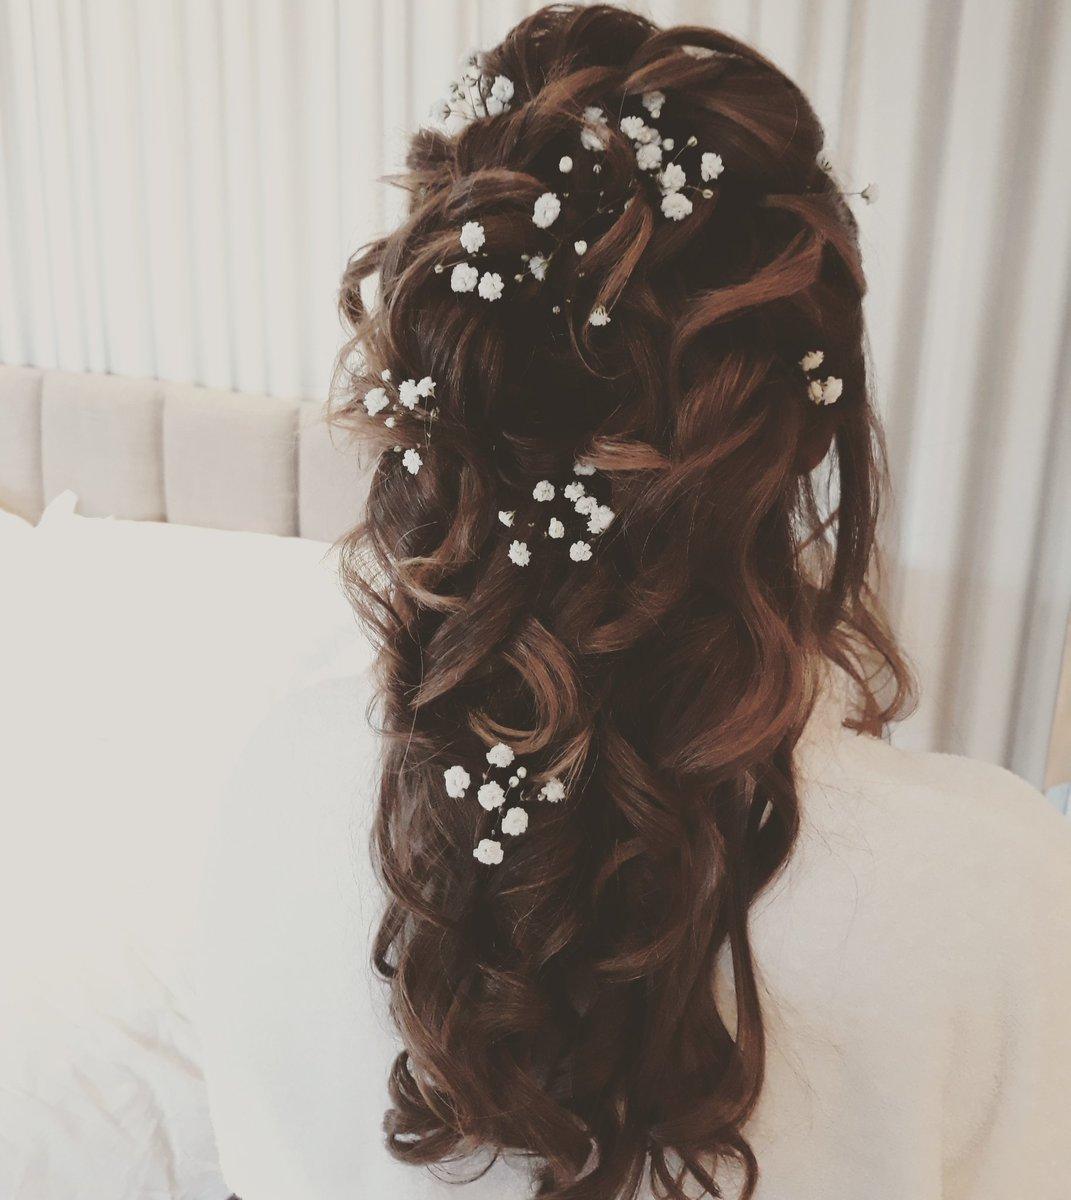 Beckies Bridal Hair On Twitter Today S Stunning Bride Suswedding Susbride Wedding Weddinghair Hairideas Halfup Curls